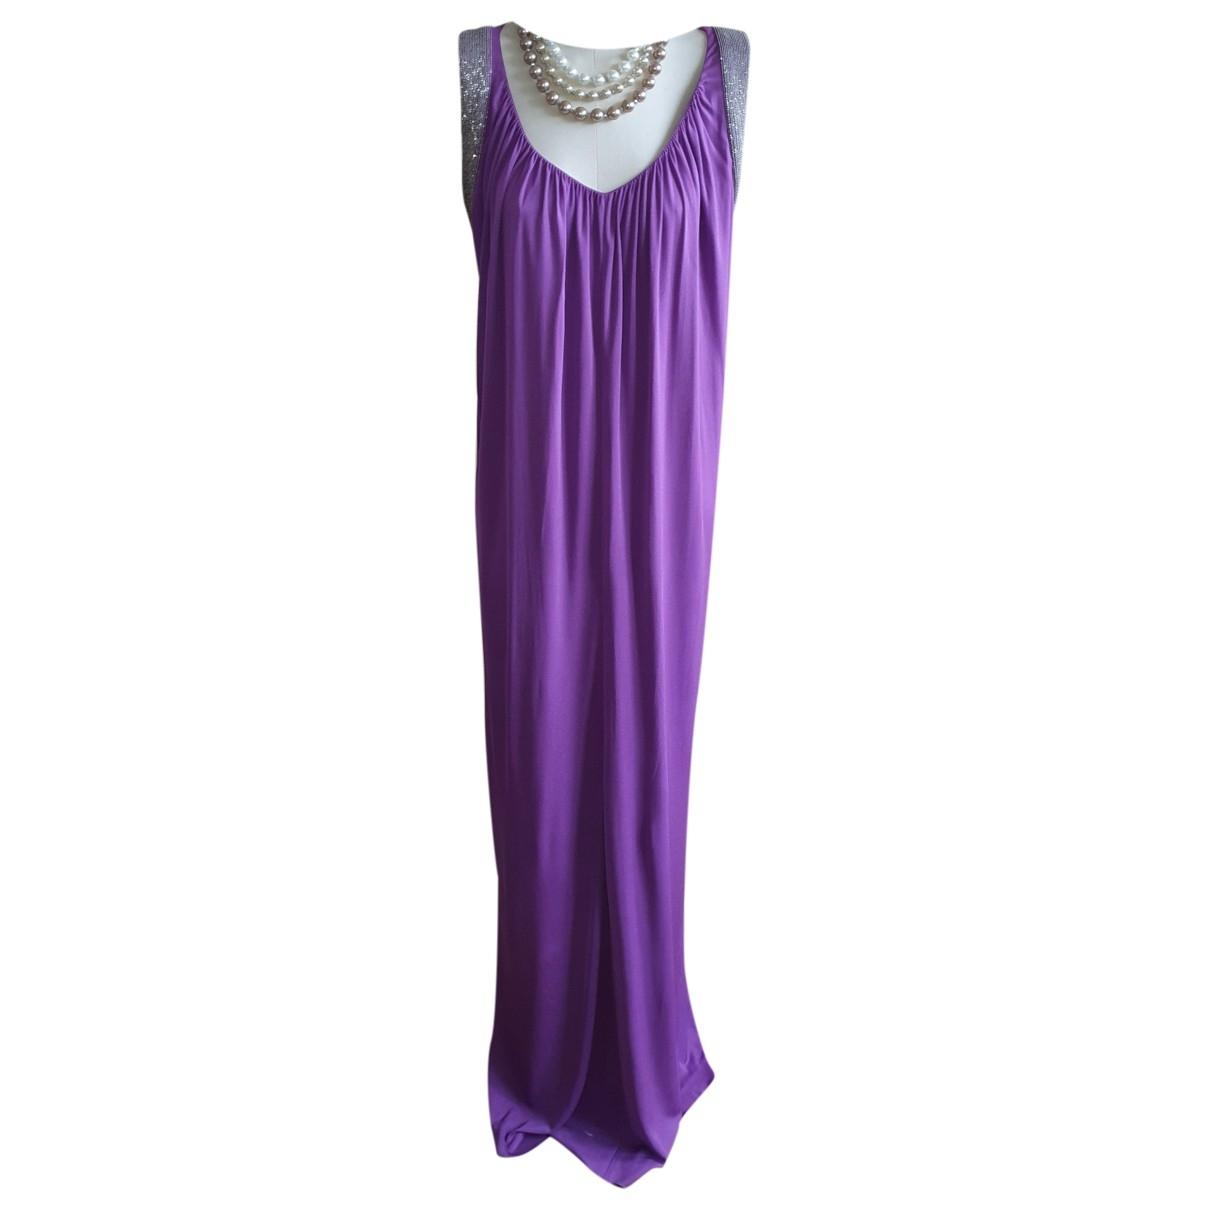 Alberta Ferretti \N Kleid in  Lila Seide